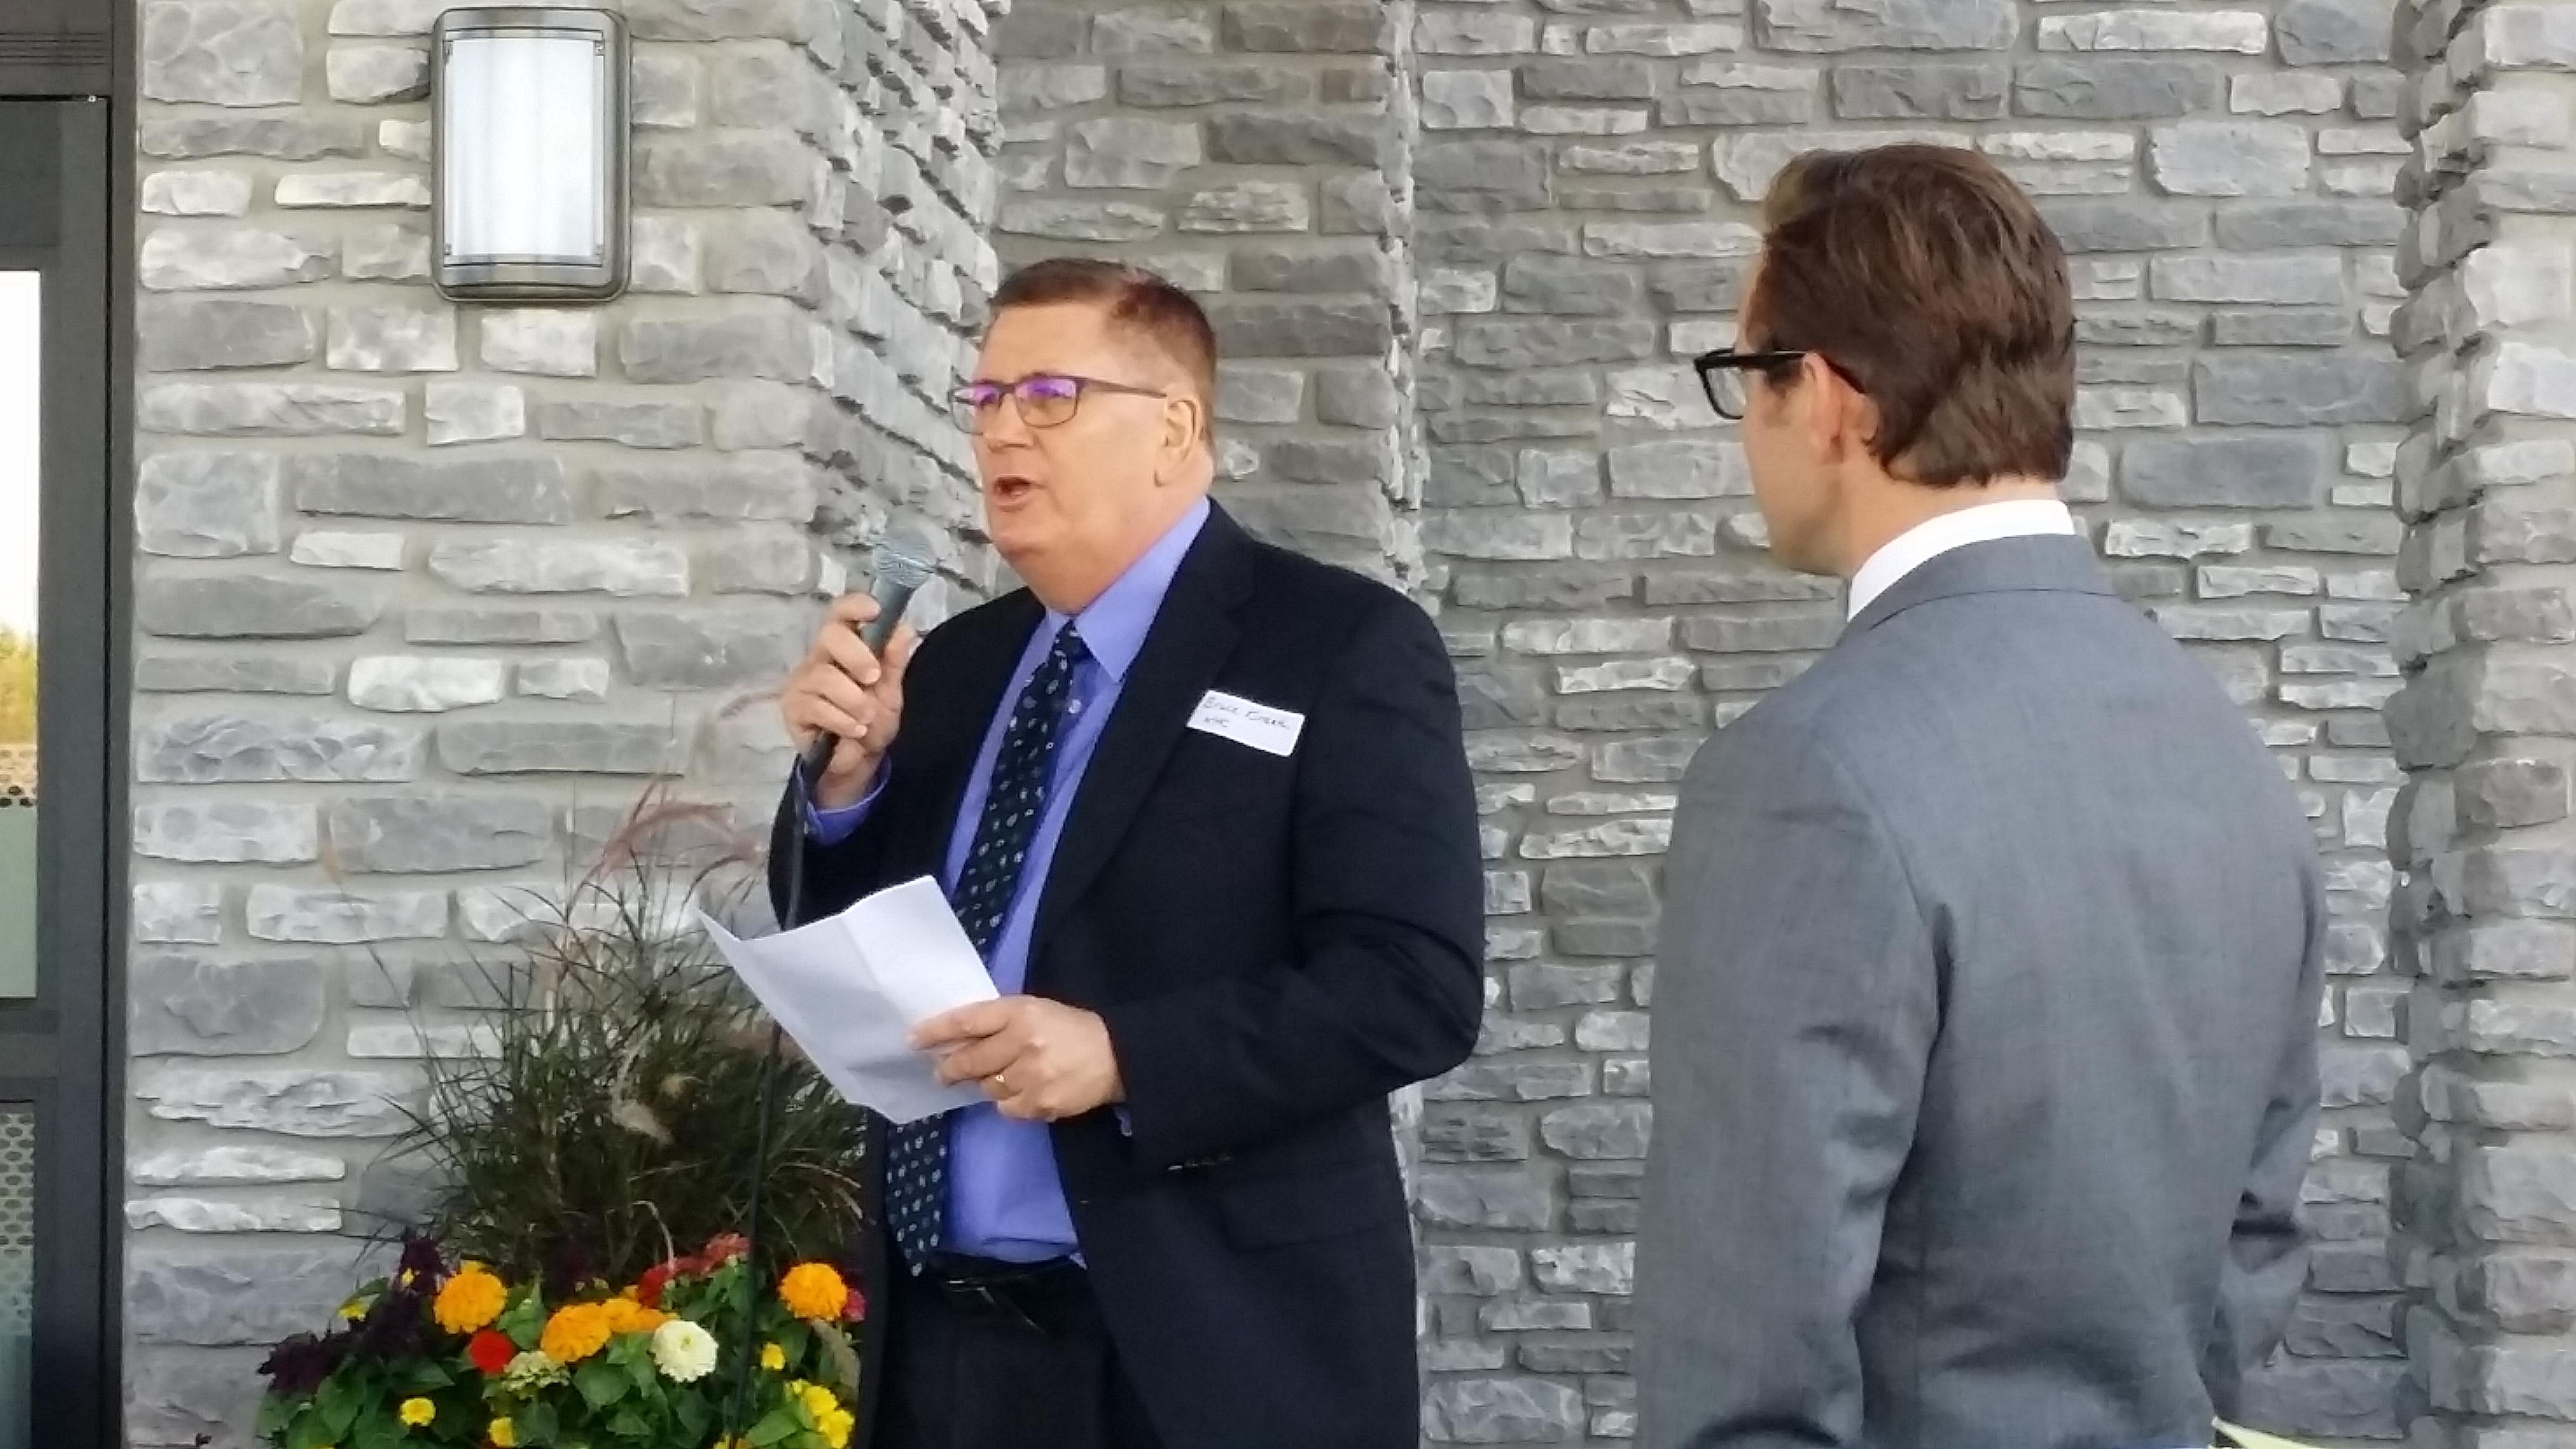 Kinseth hospitality companies announces ribbon cutting grand opening celebration at the hampton inn suites kenosha wisconsin